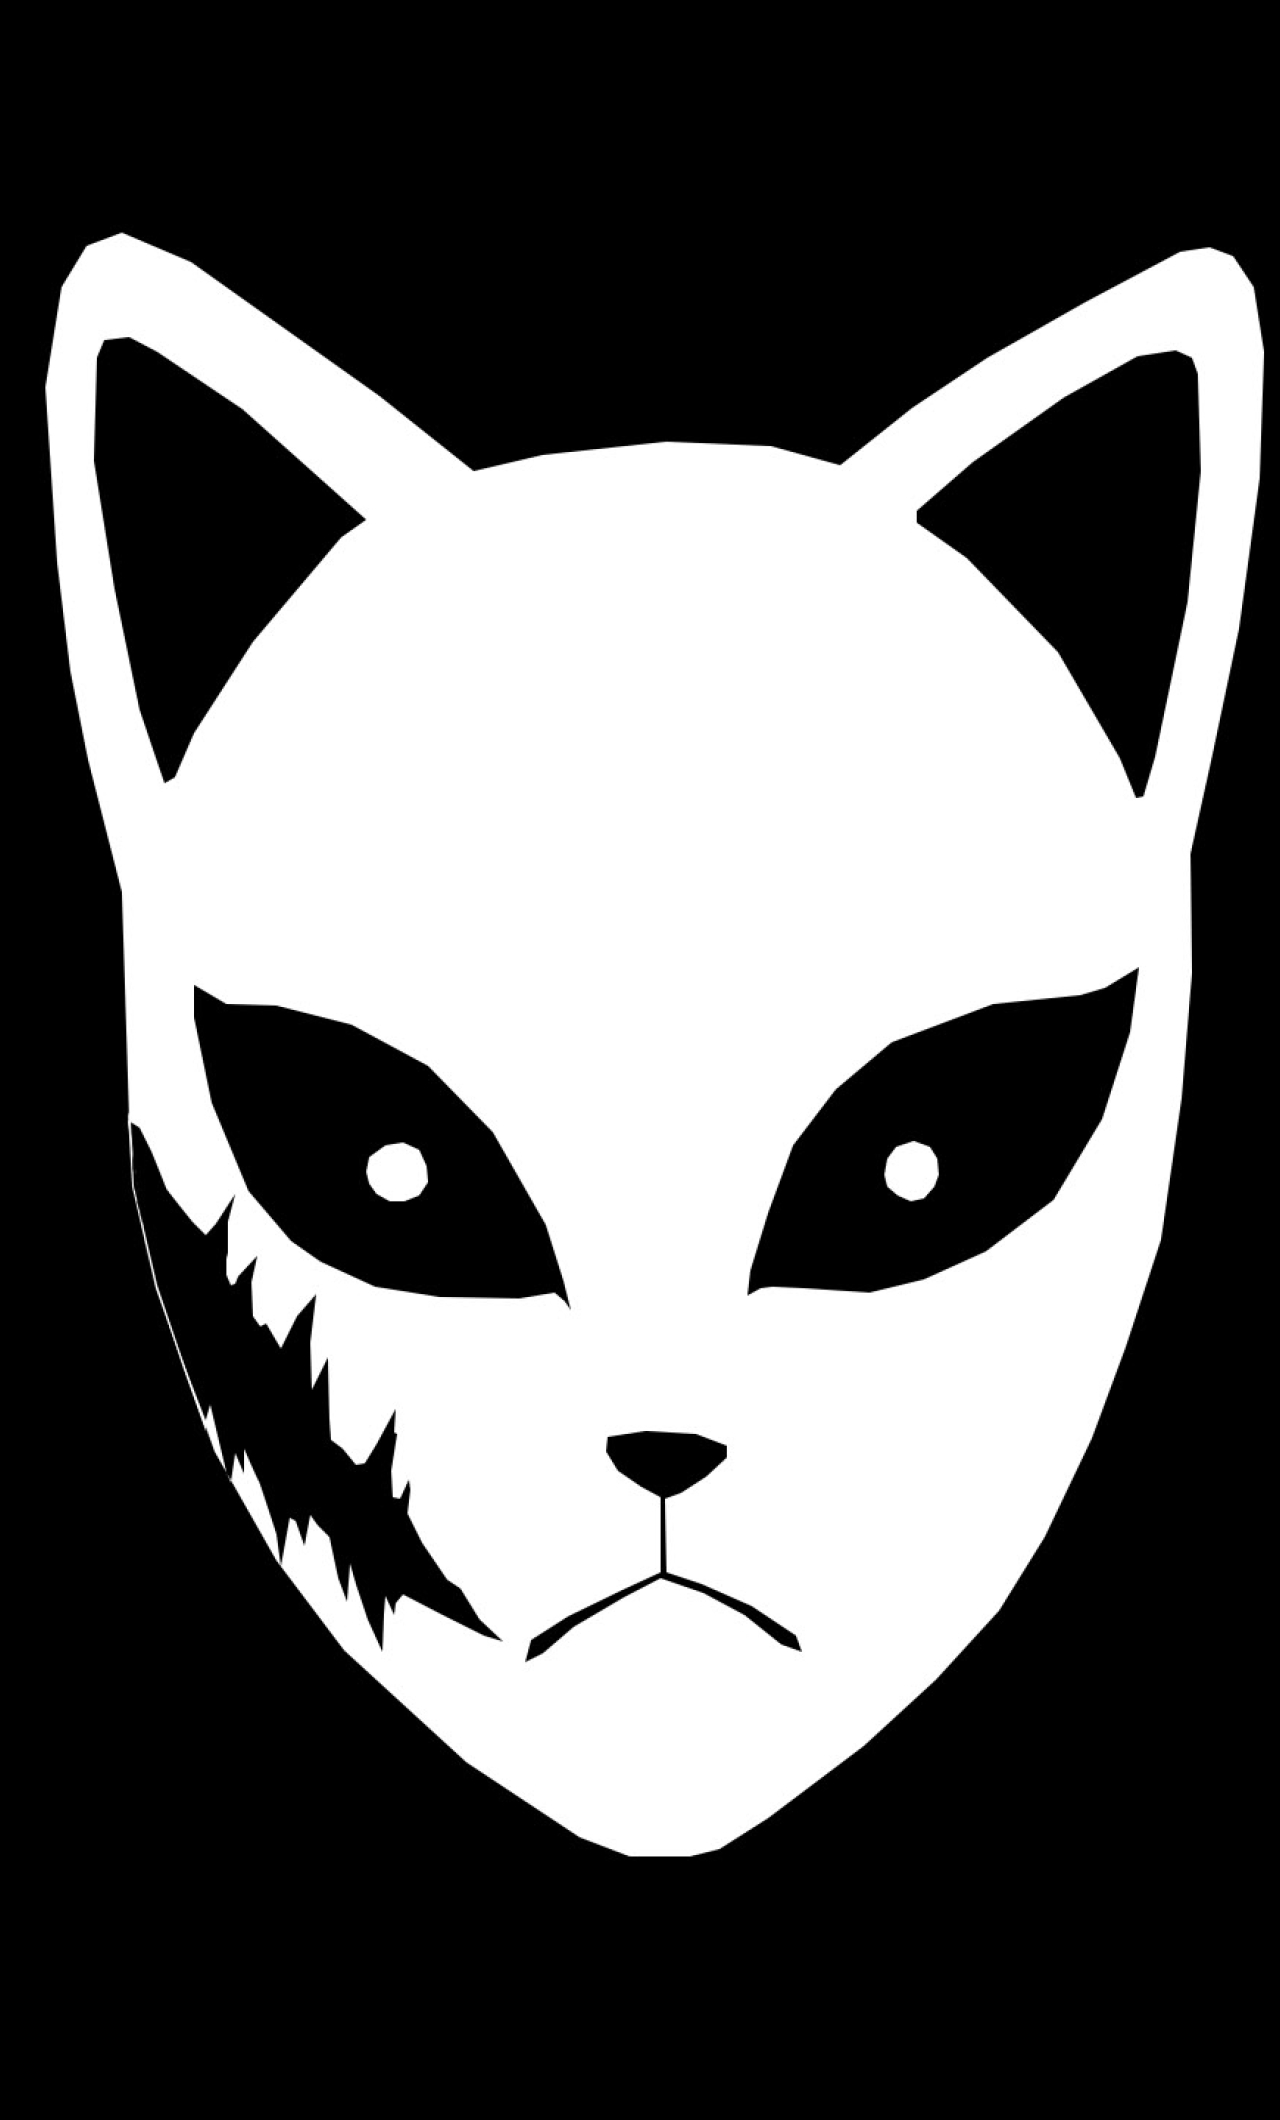 Sabito Mask Wallpaper in 1280x2120 Resolution